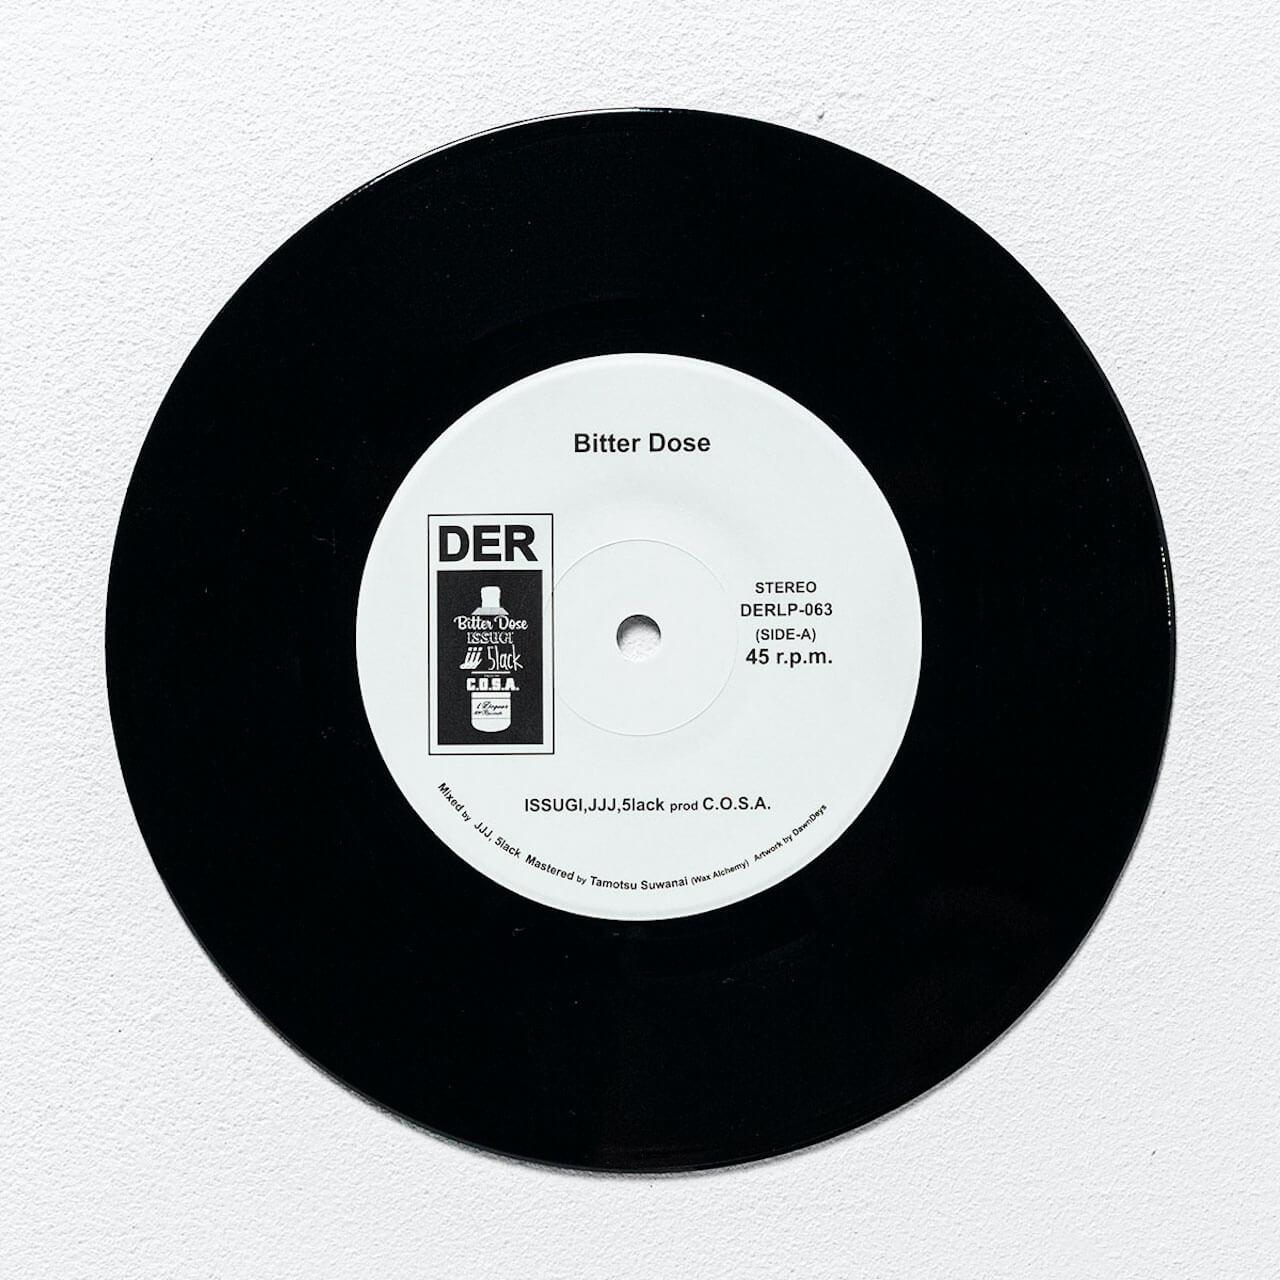 ISSUGI、JJJ、5lackによるシングル「Bitter Dose」prod C.O.S.A.が7インチでリリース music201023-issugi-jjj-5lack-cosa-2